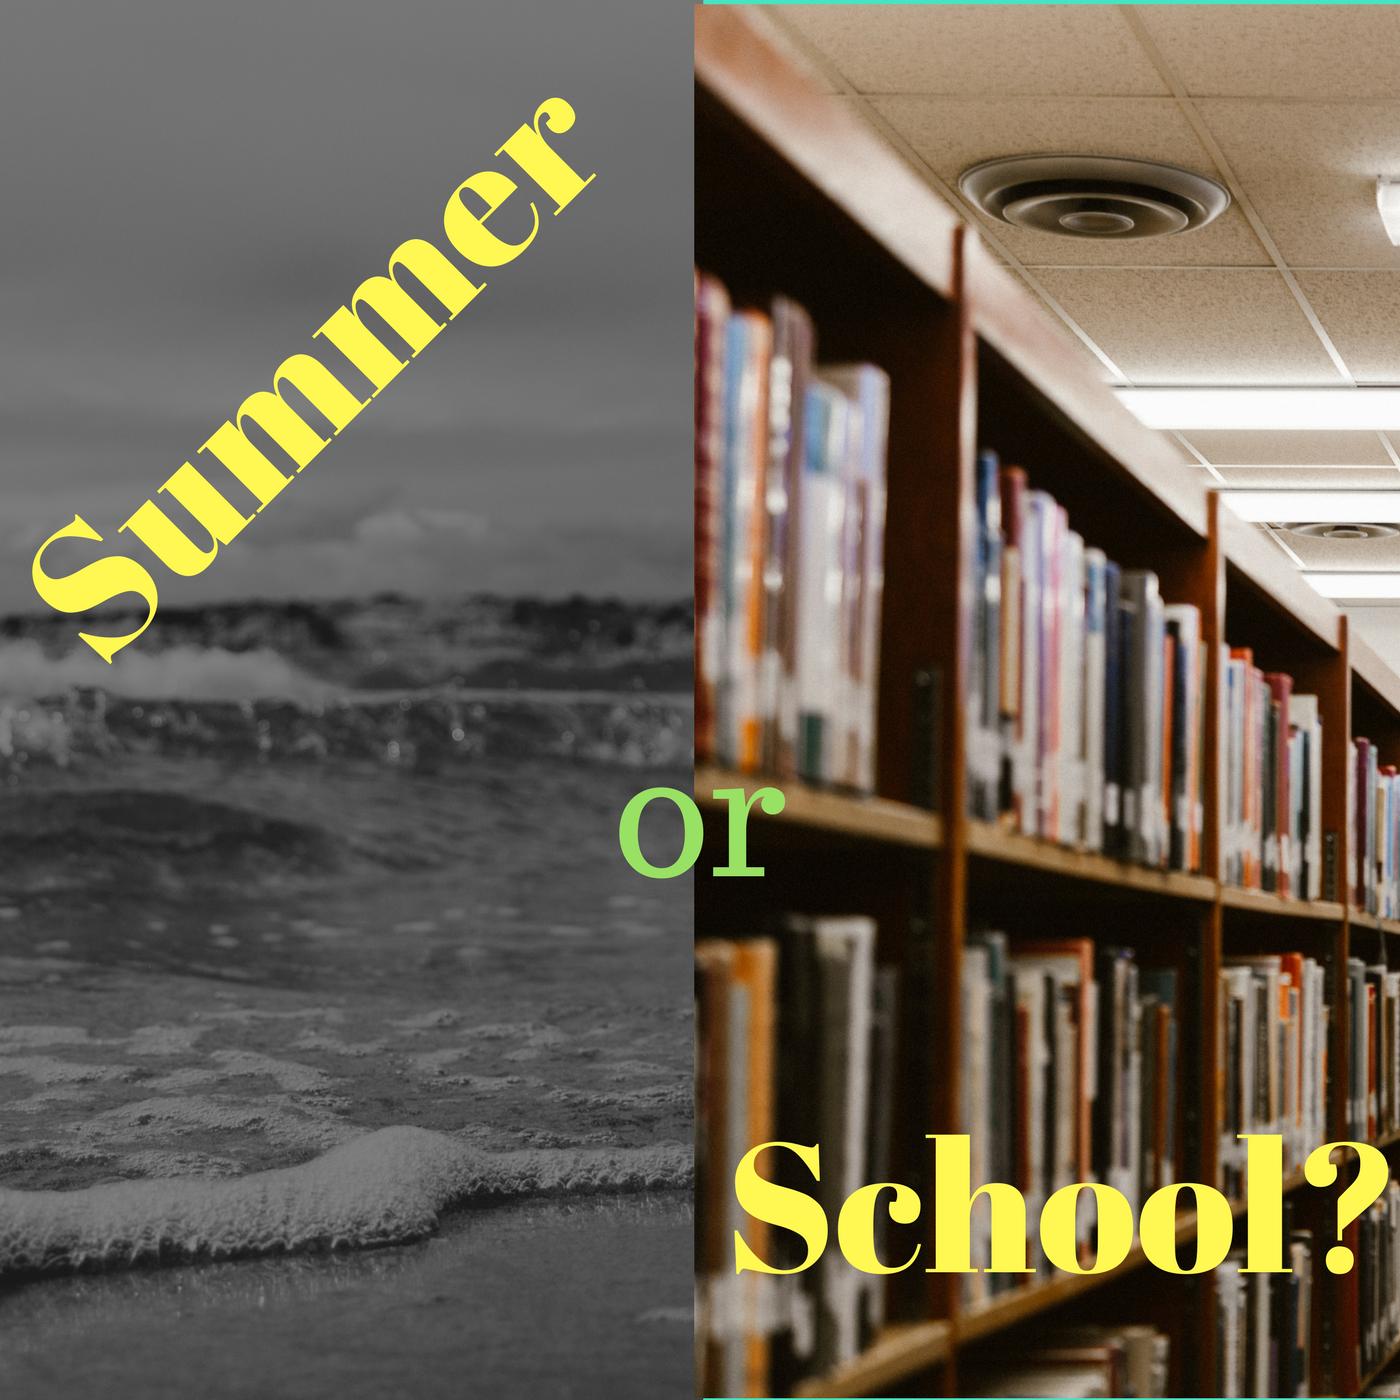 A clash of a summer image and a school image. Photos by Despo Potamou and Priscilla Du PreezonUnsplash.